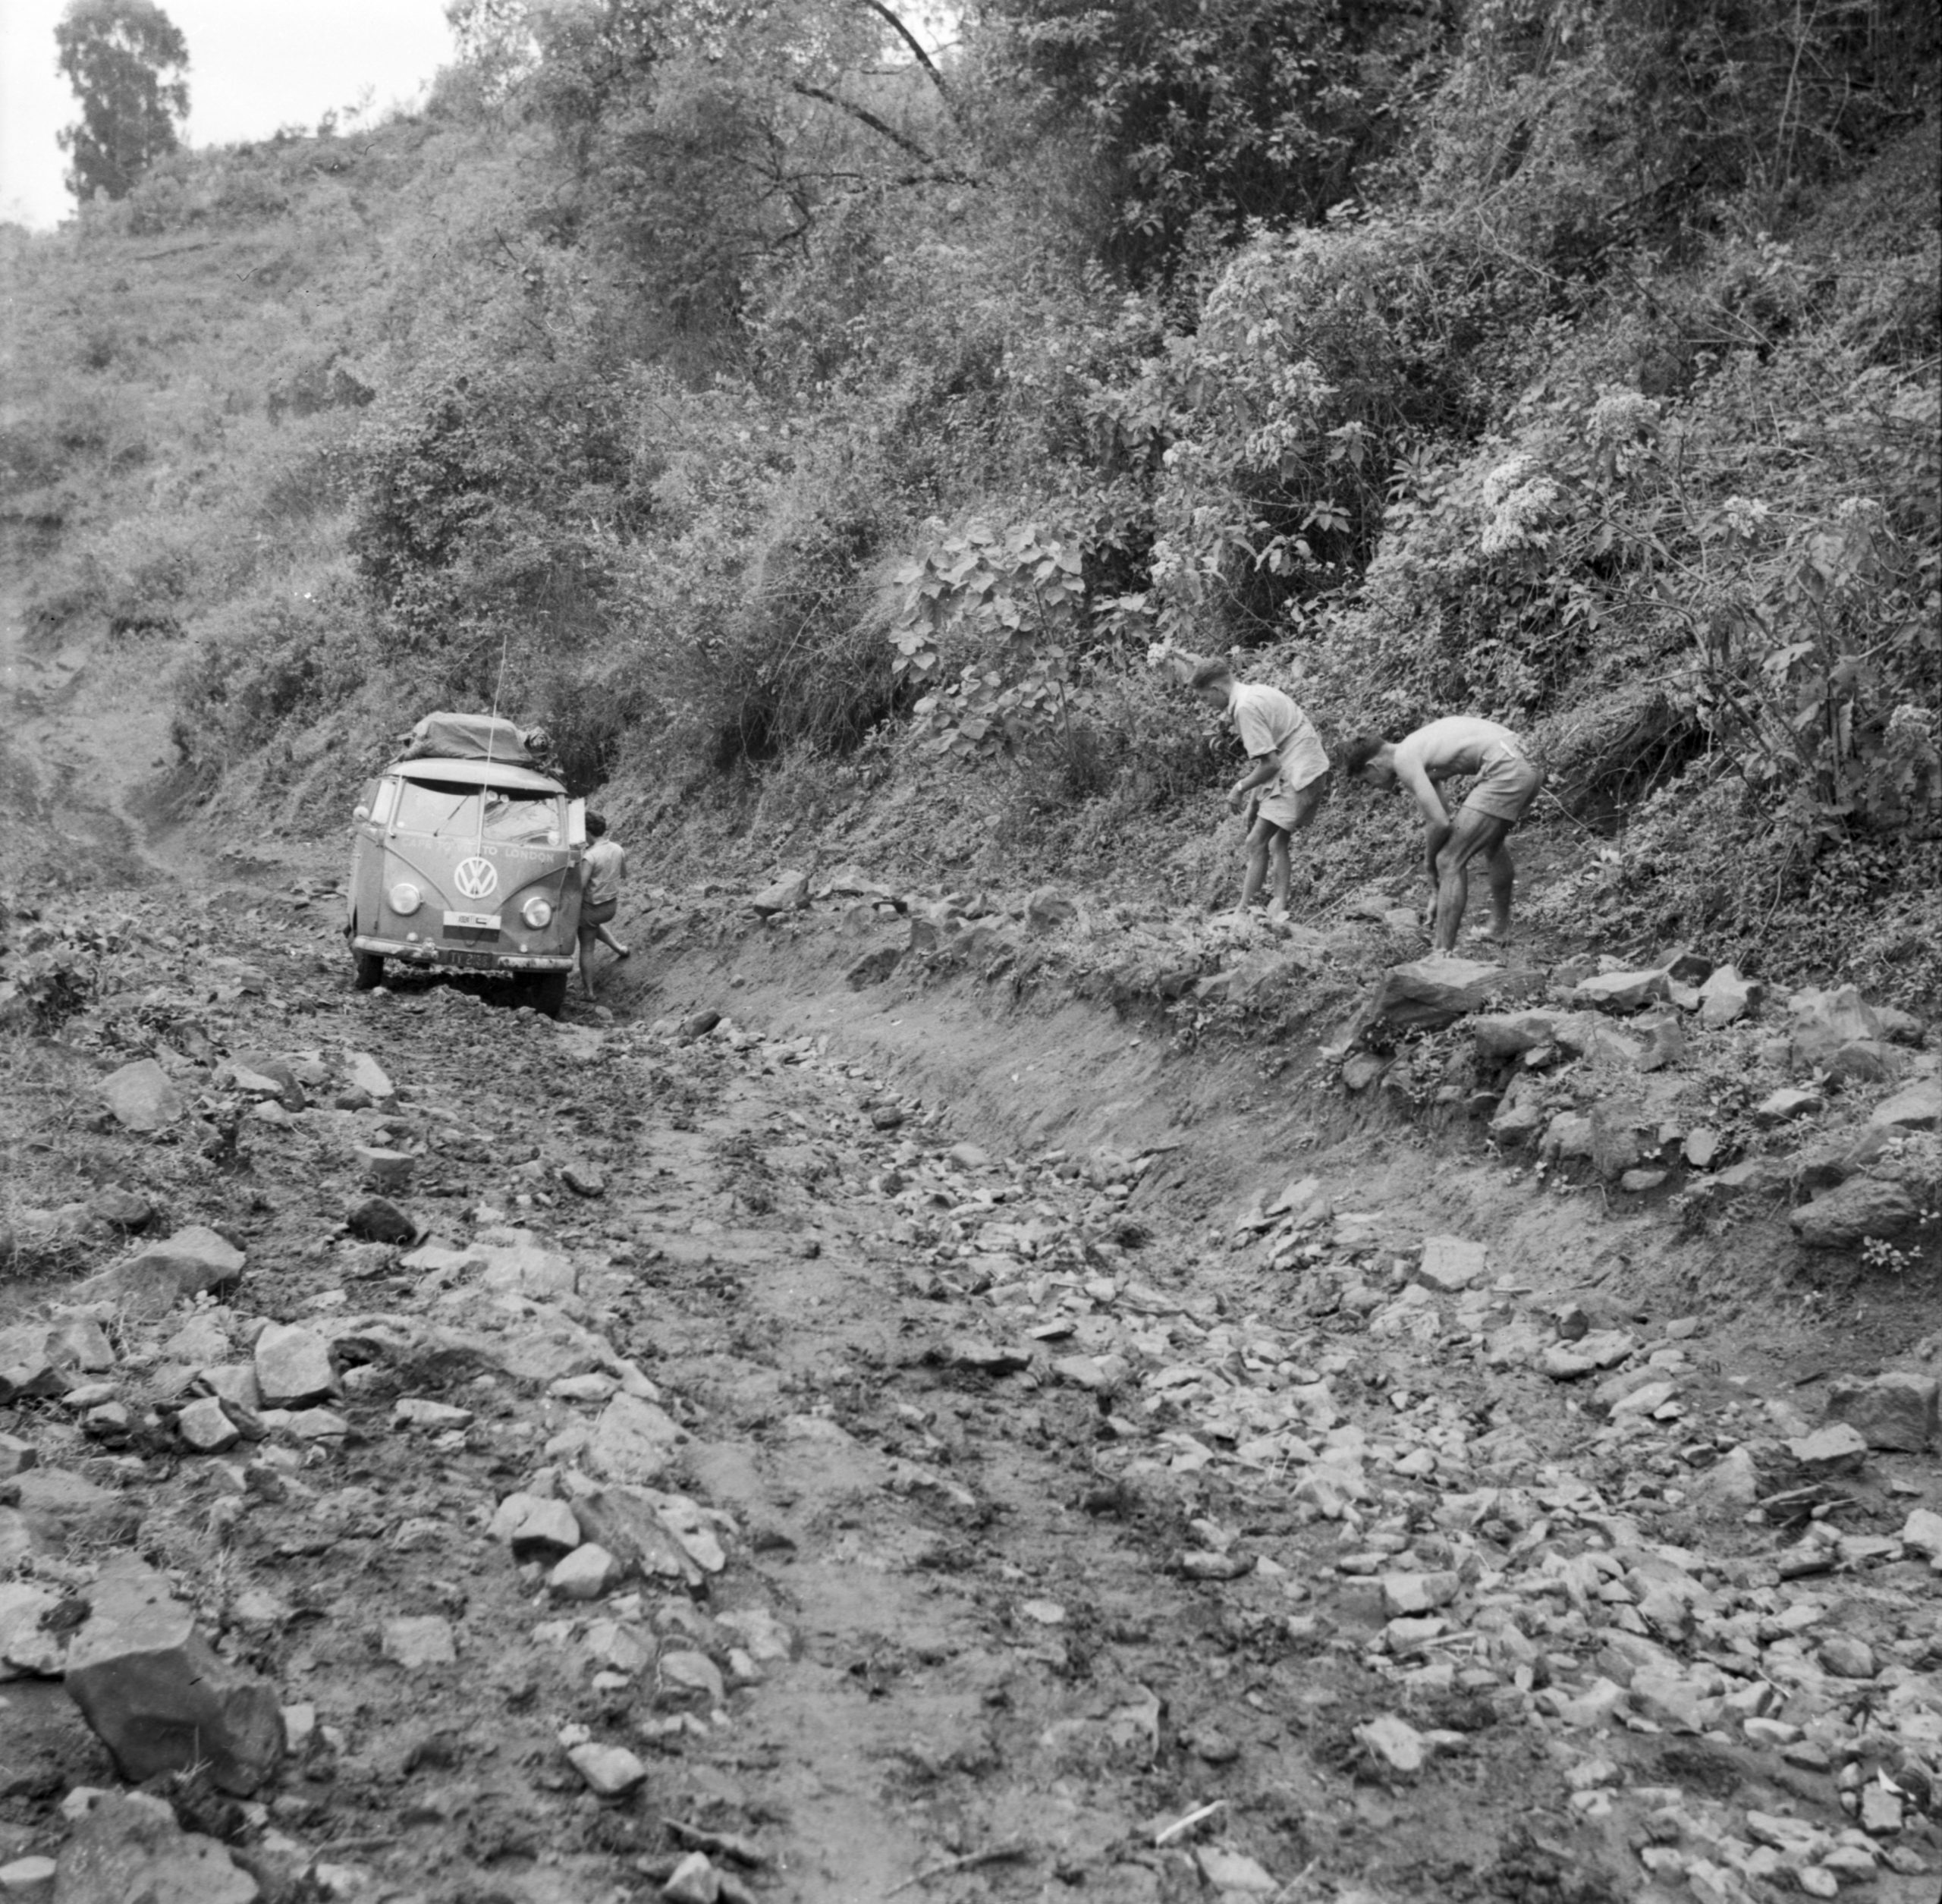 Home is a Journey - Feb 10 - rocky roads